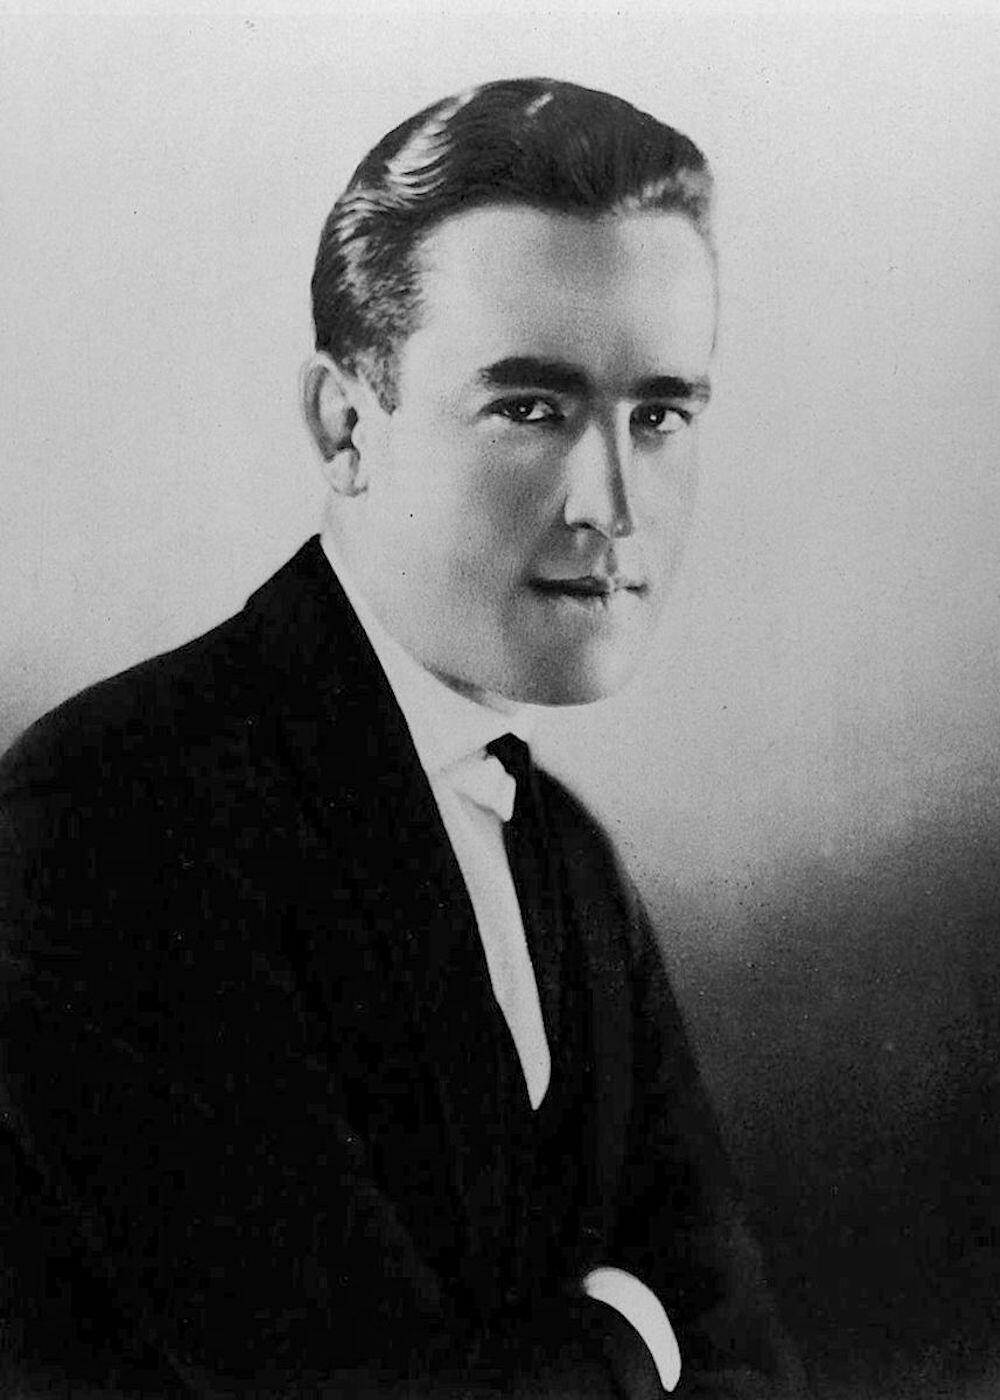 Abbe James Edward ritratto Harold Lloyd Jul (1922)